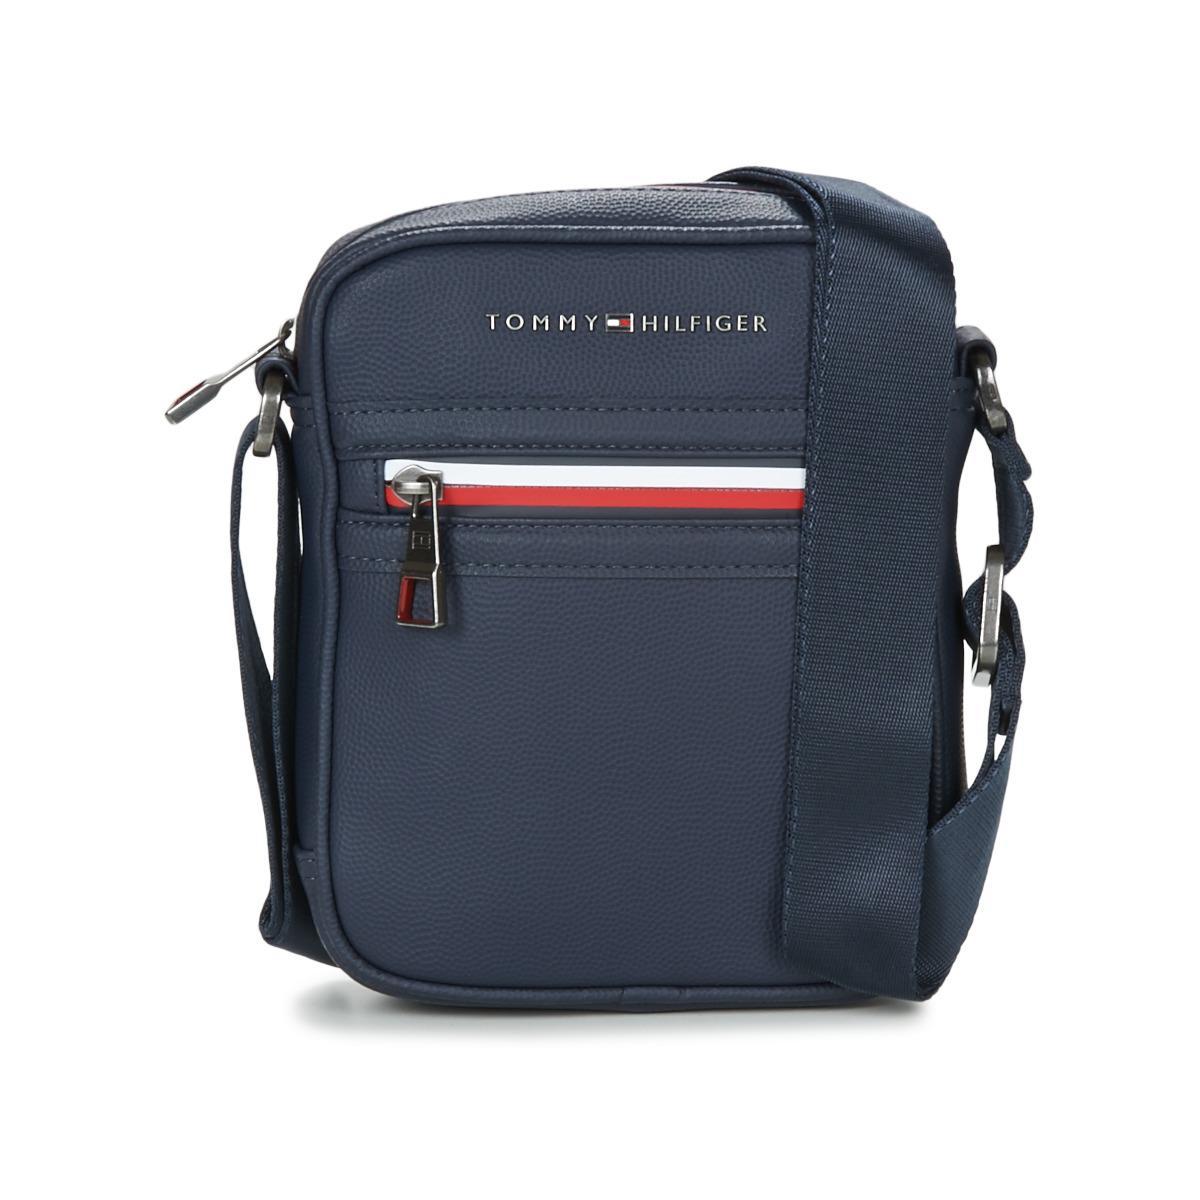 Tommy Hilfiger Essential Mini Reporter Ii Men s Pouch In Blue in ... 9662e8cc8e47c